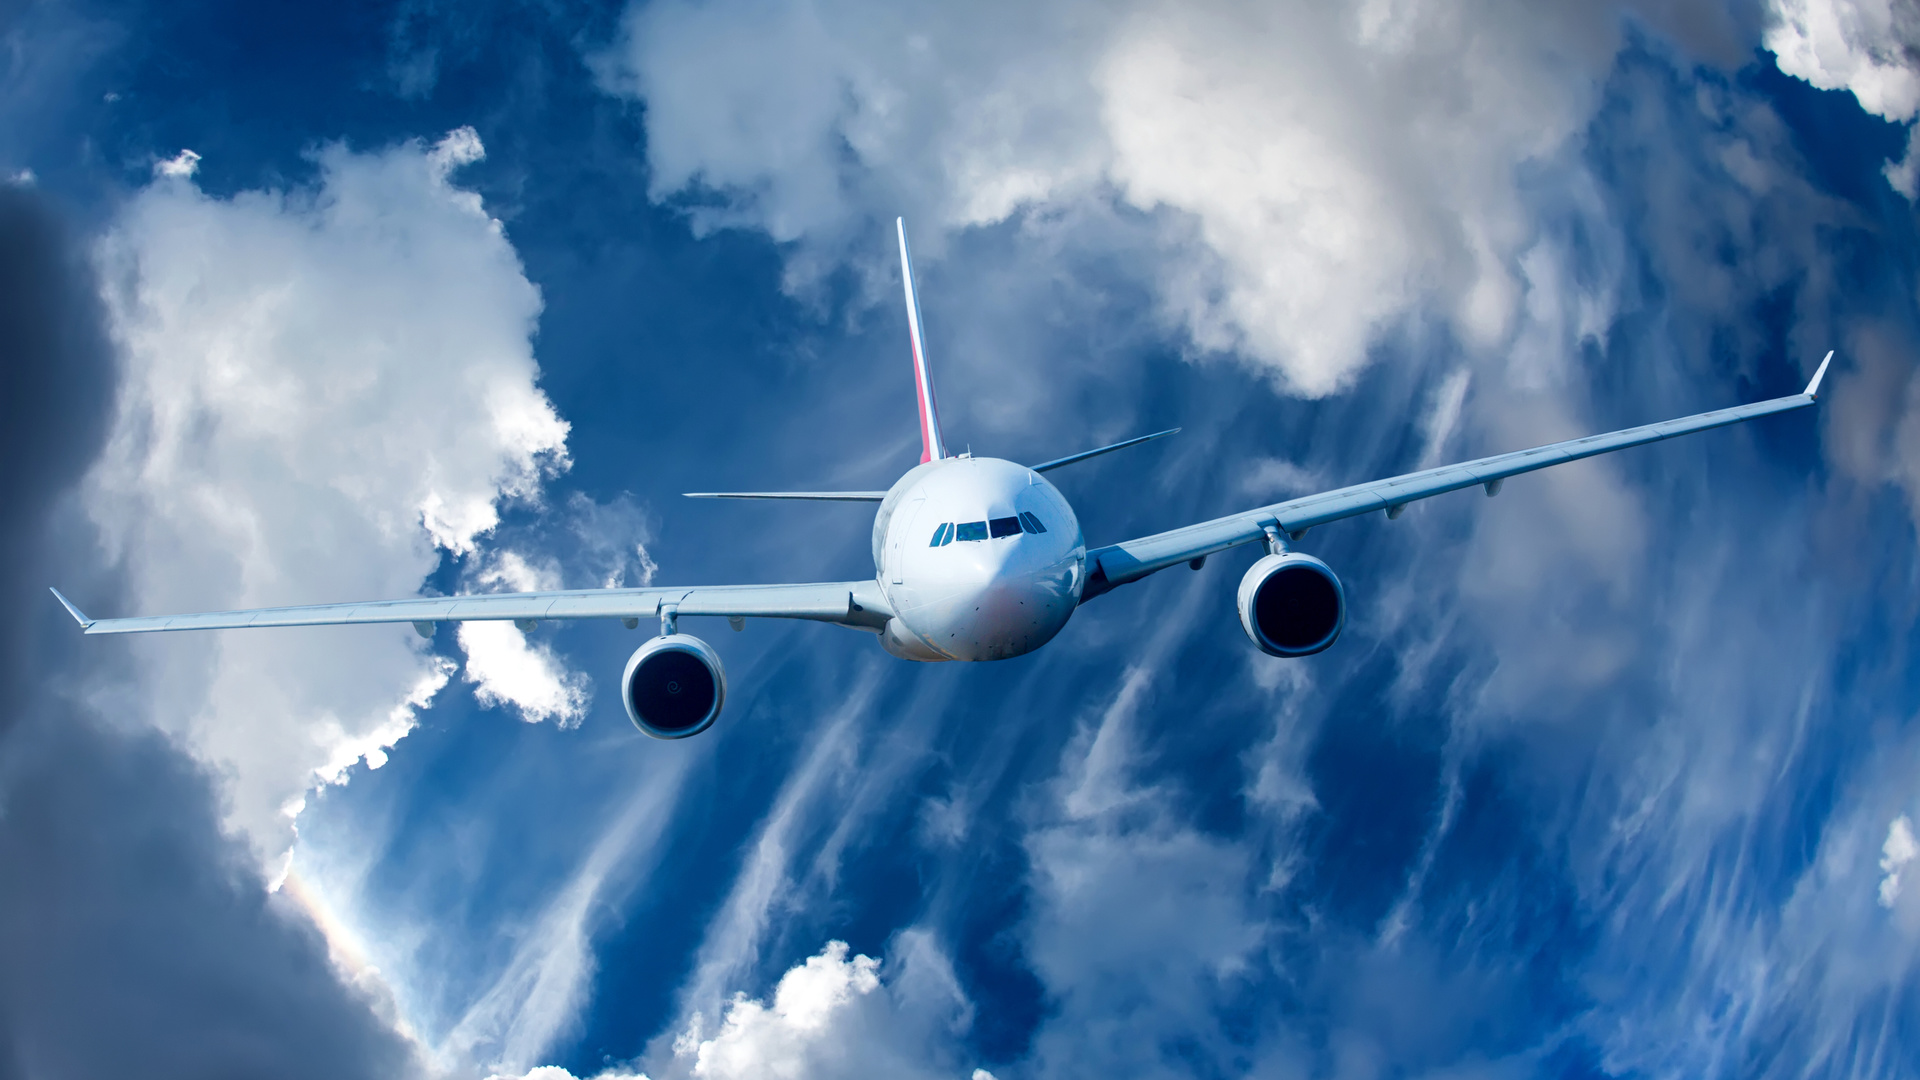 Водопада, картинки в пути самолет